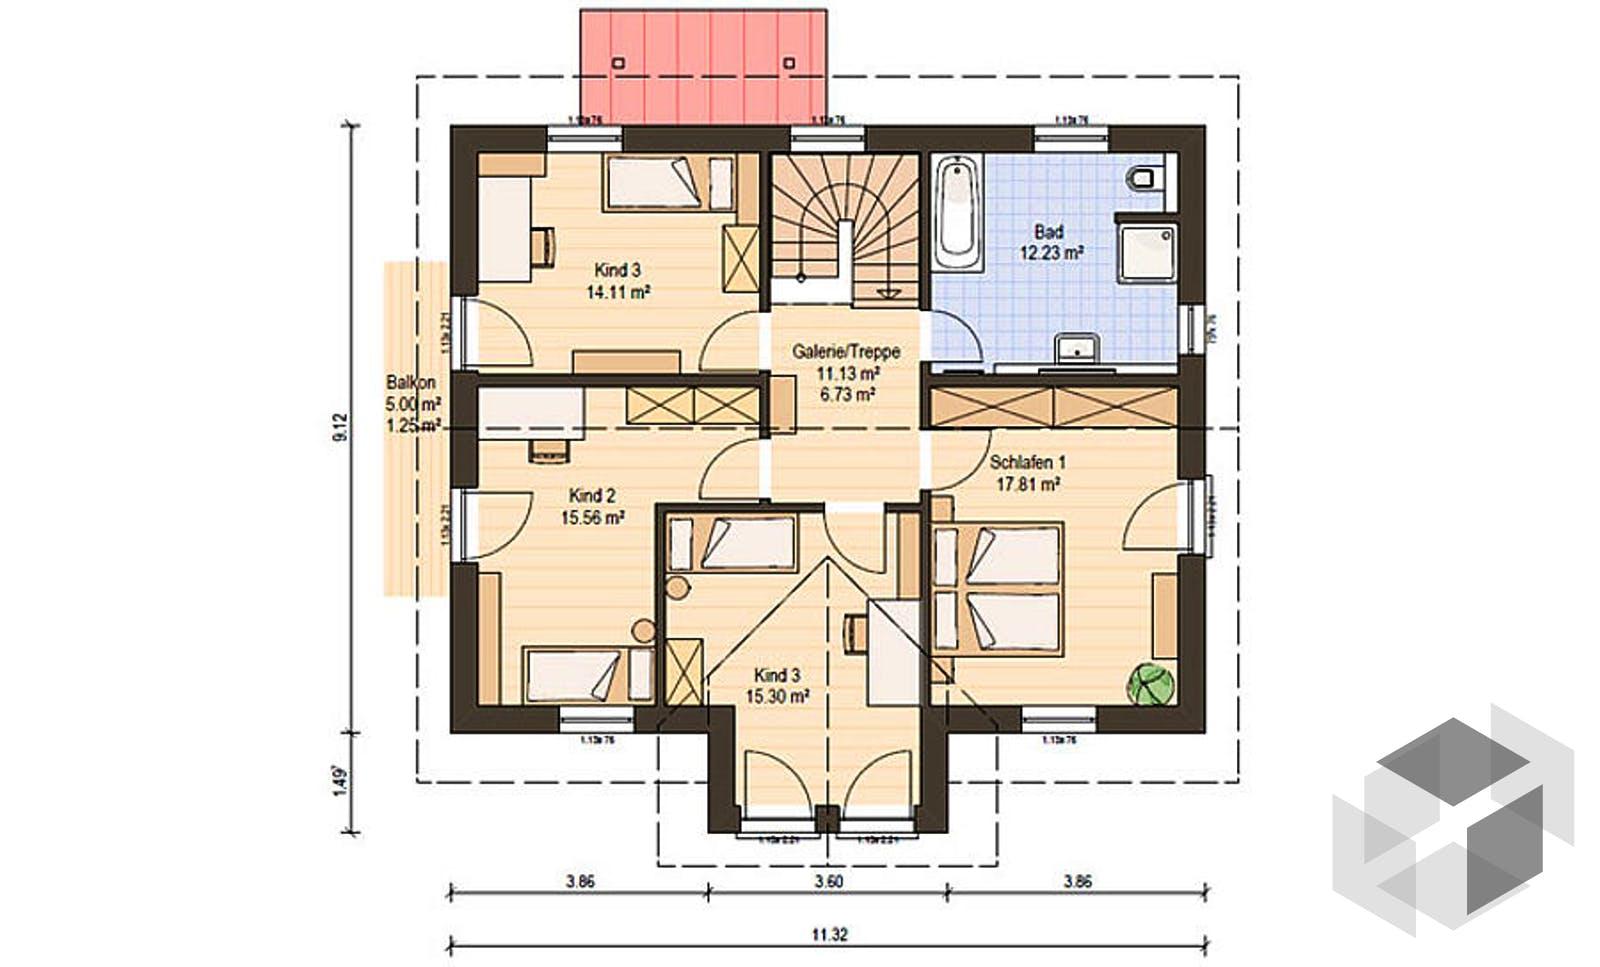 Haas s 165 a von haas haus komplette daten bersicht for Floor plans for 160 000